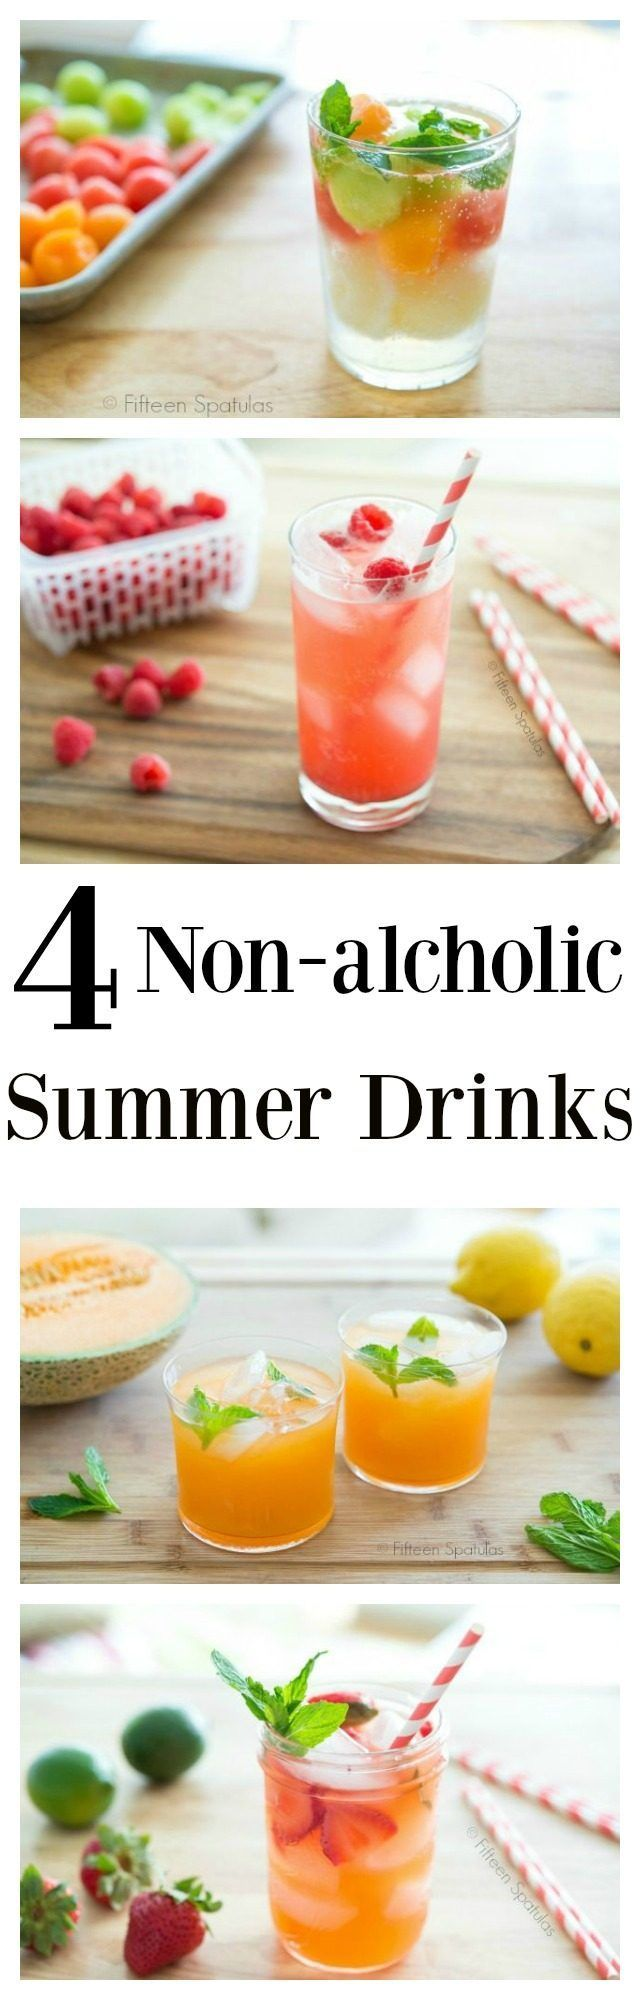 Four non-alcoholic refreshing summer drink recipes. Cantaloupe agua fresca, rasp…